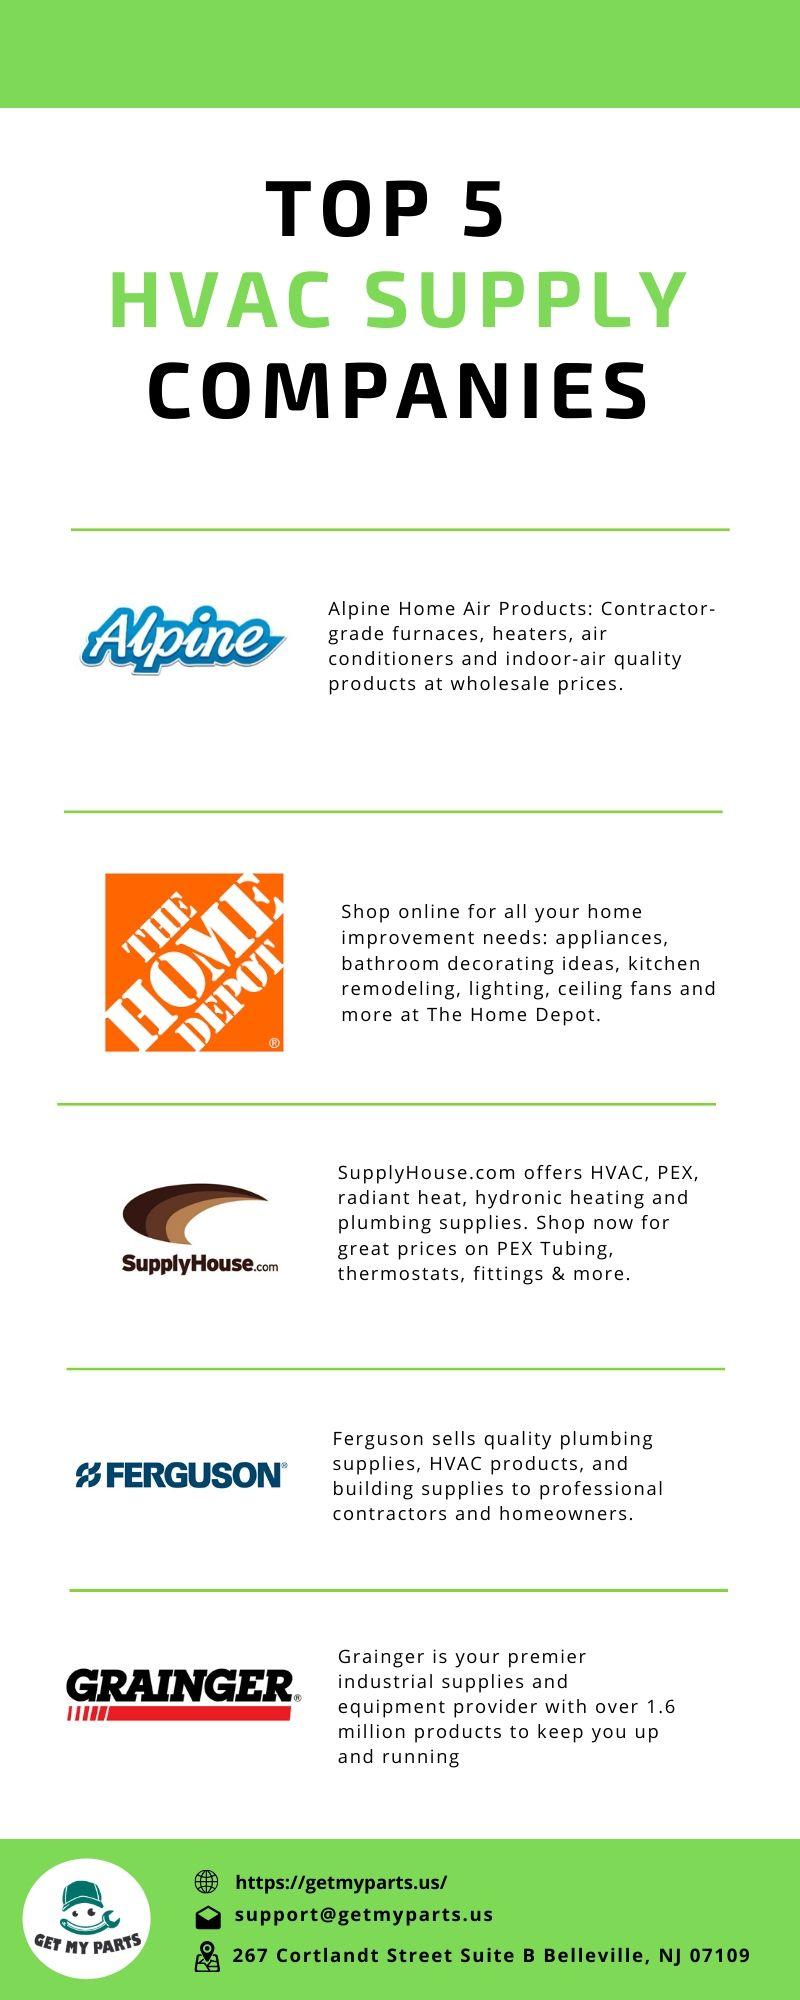 Top 5 HVAC Supply Companies [INFOGRAPHIC]